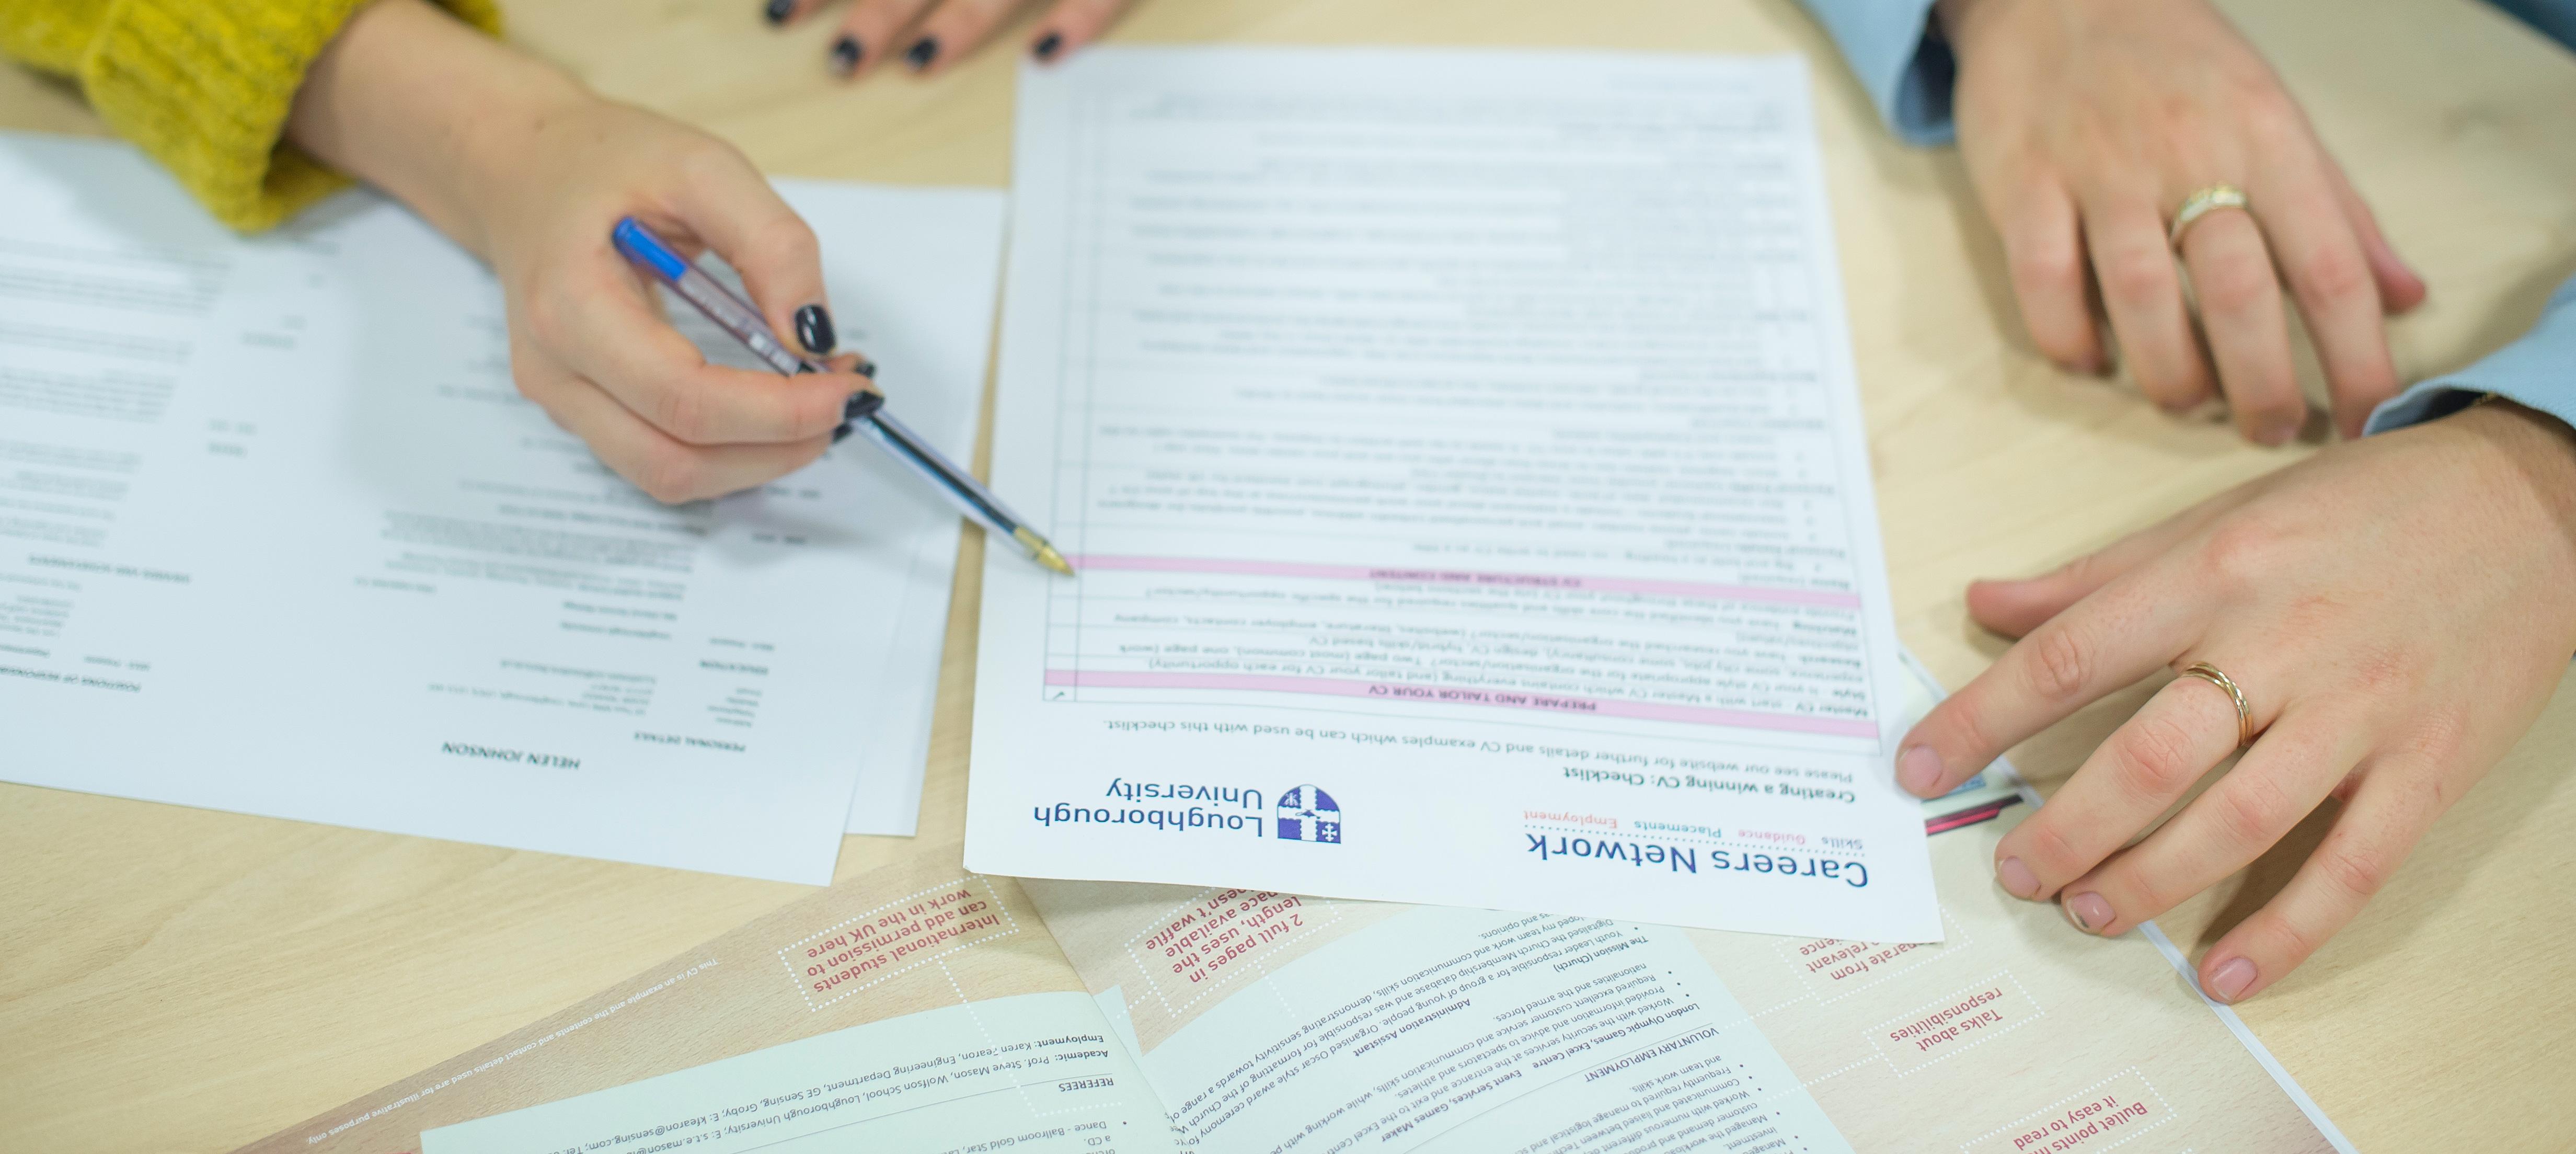 Make applications | Careers Network | Loughborough University